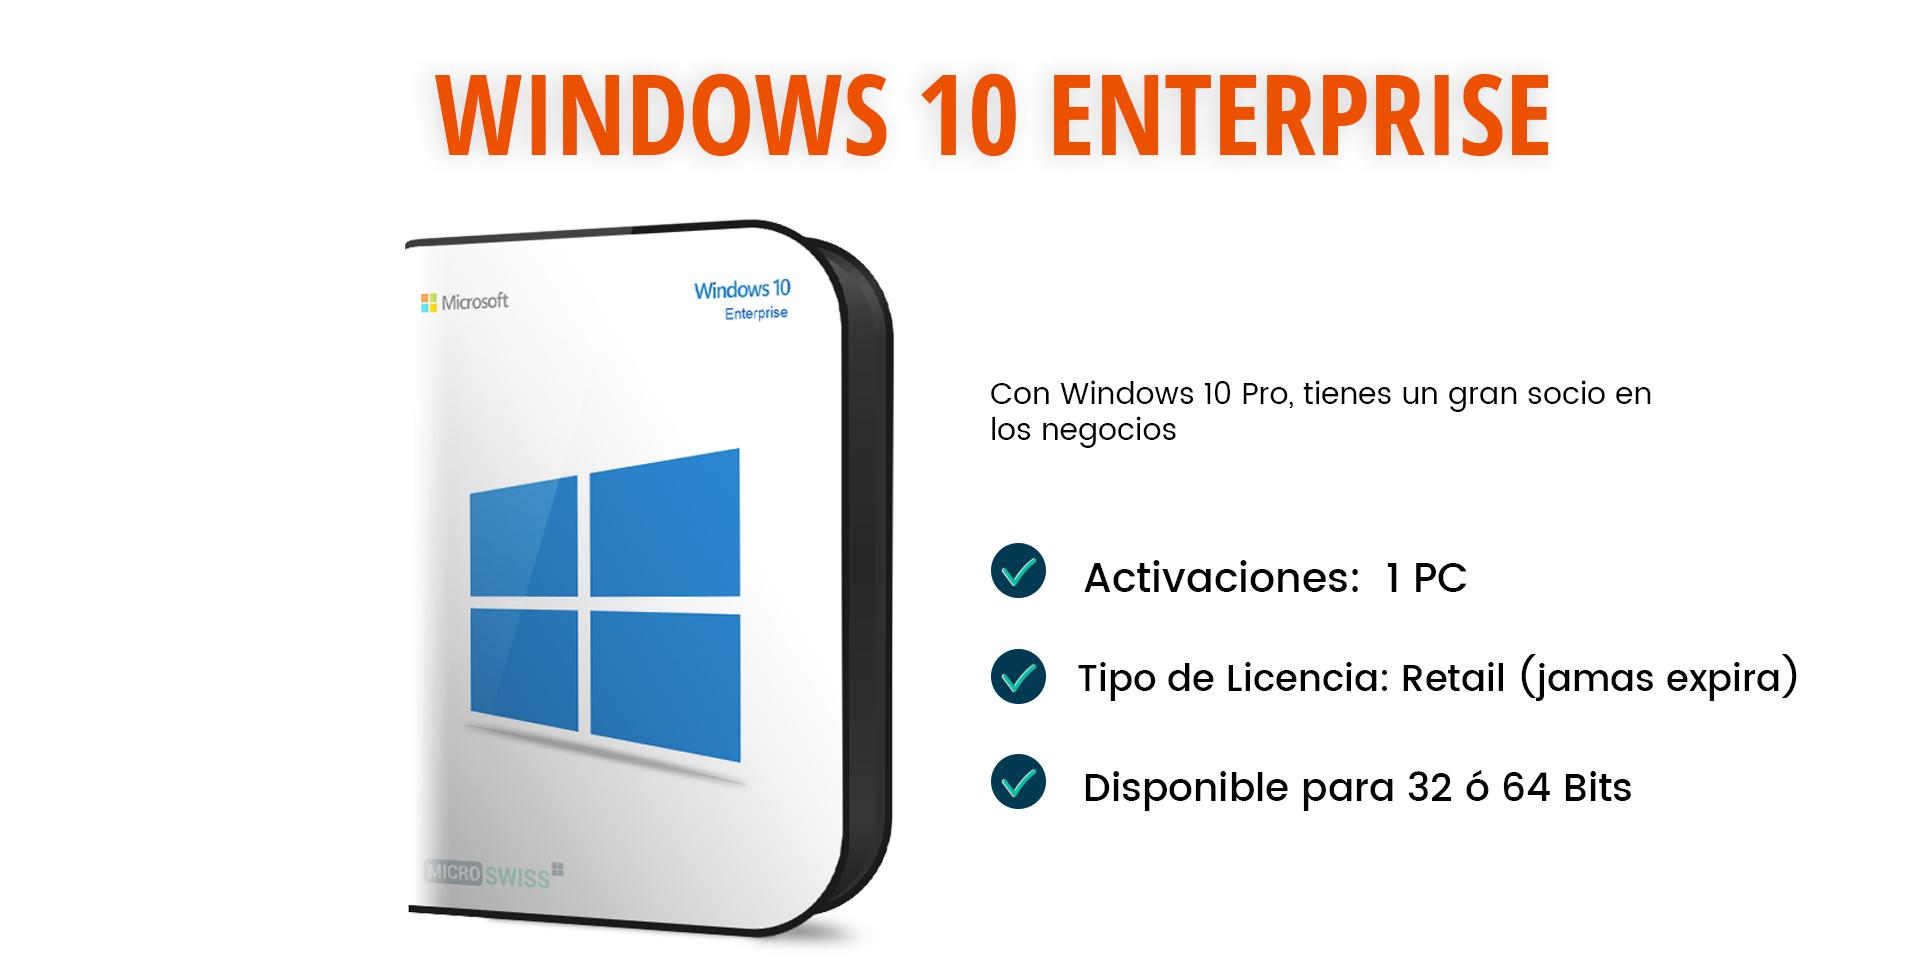 windows10enterprise